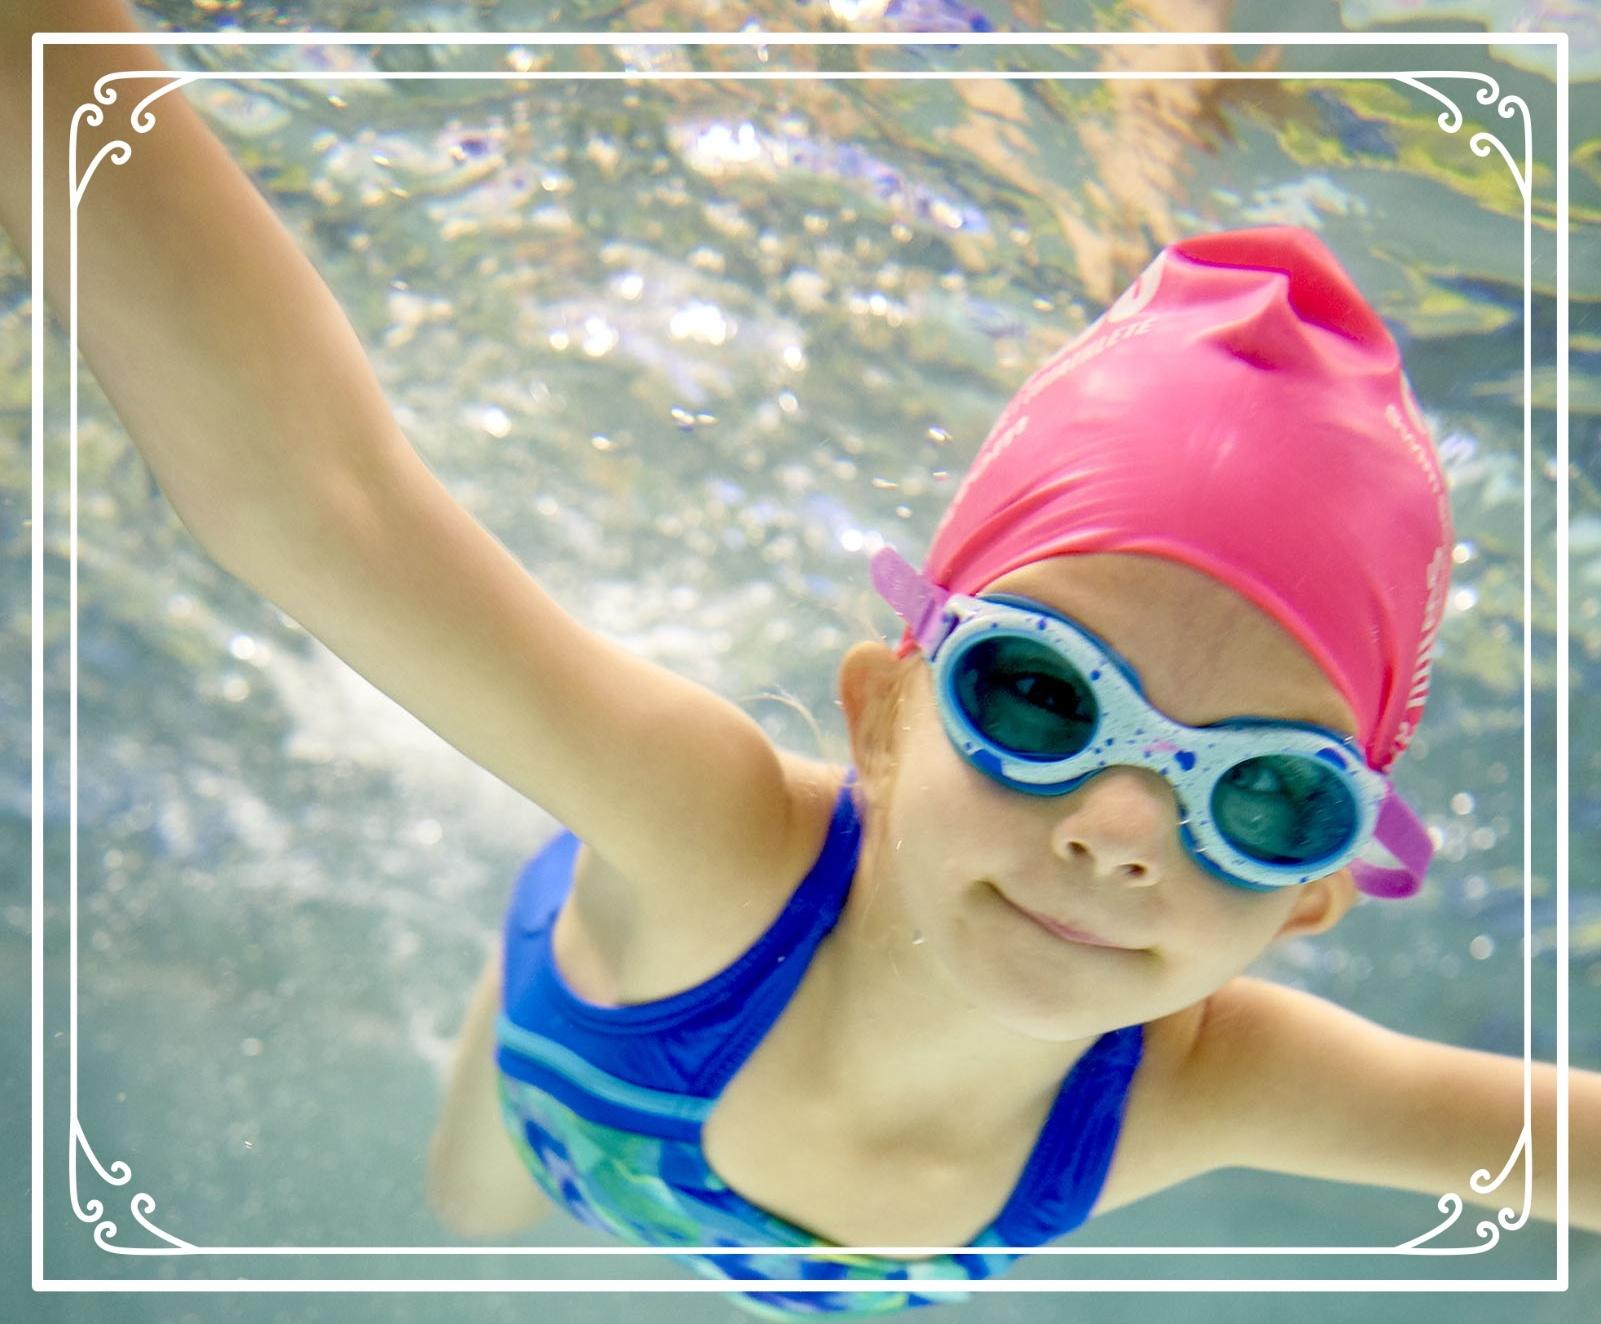 Shot9_KidsLearnToSwim146-685114-edited.jpg